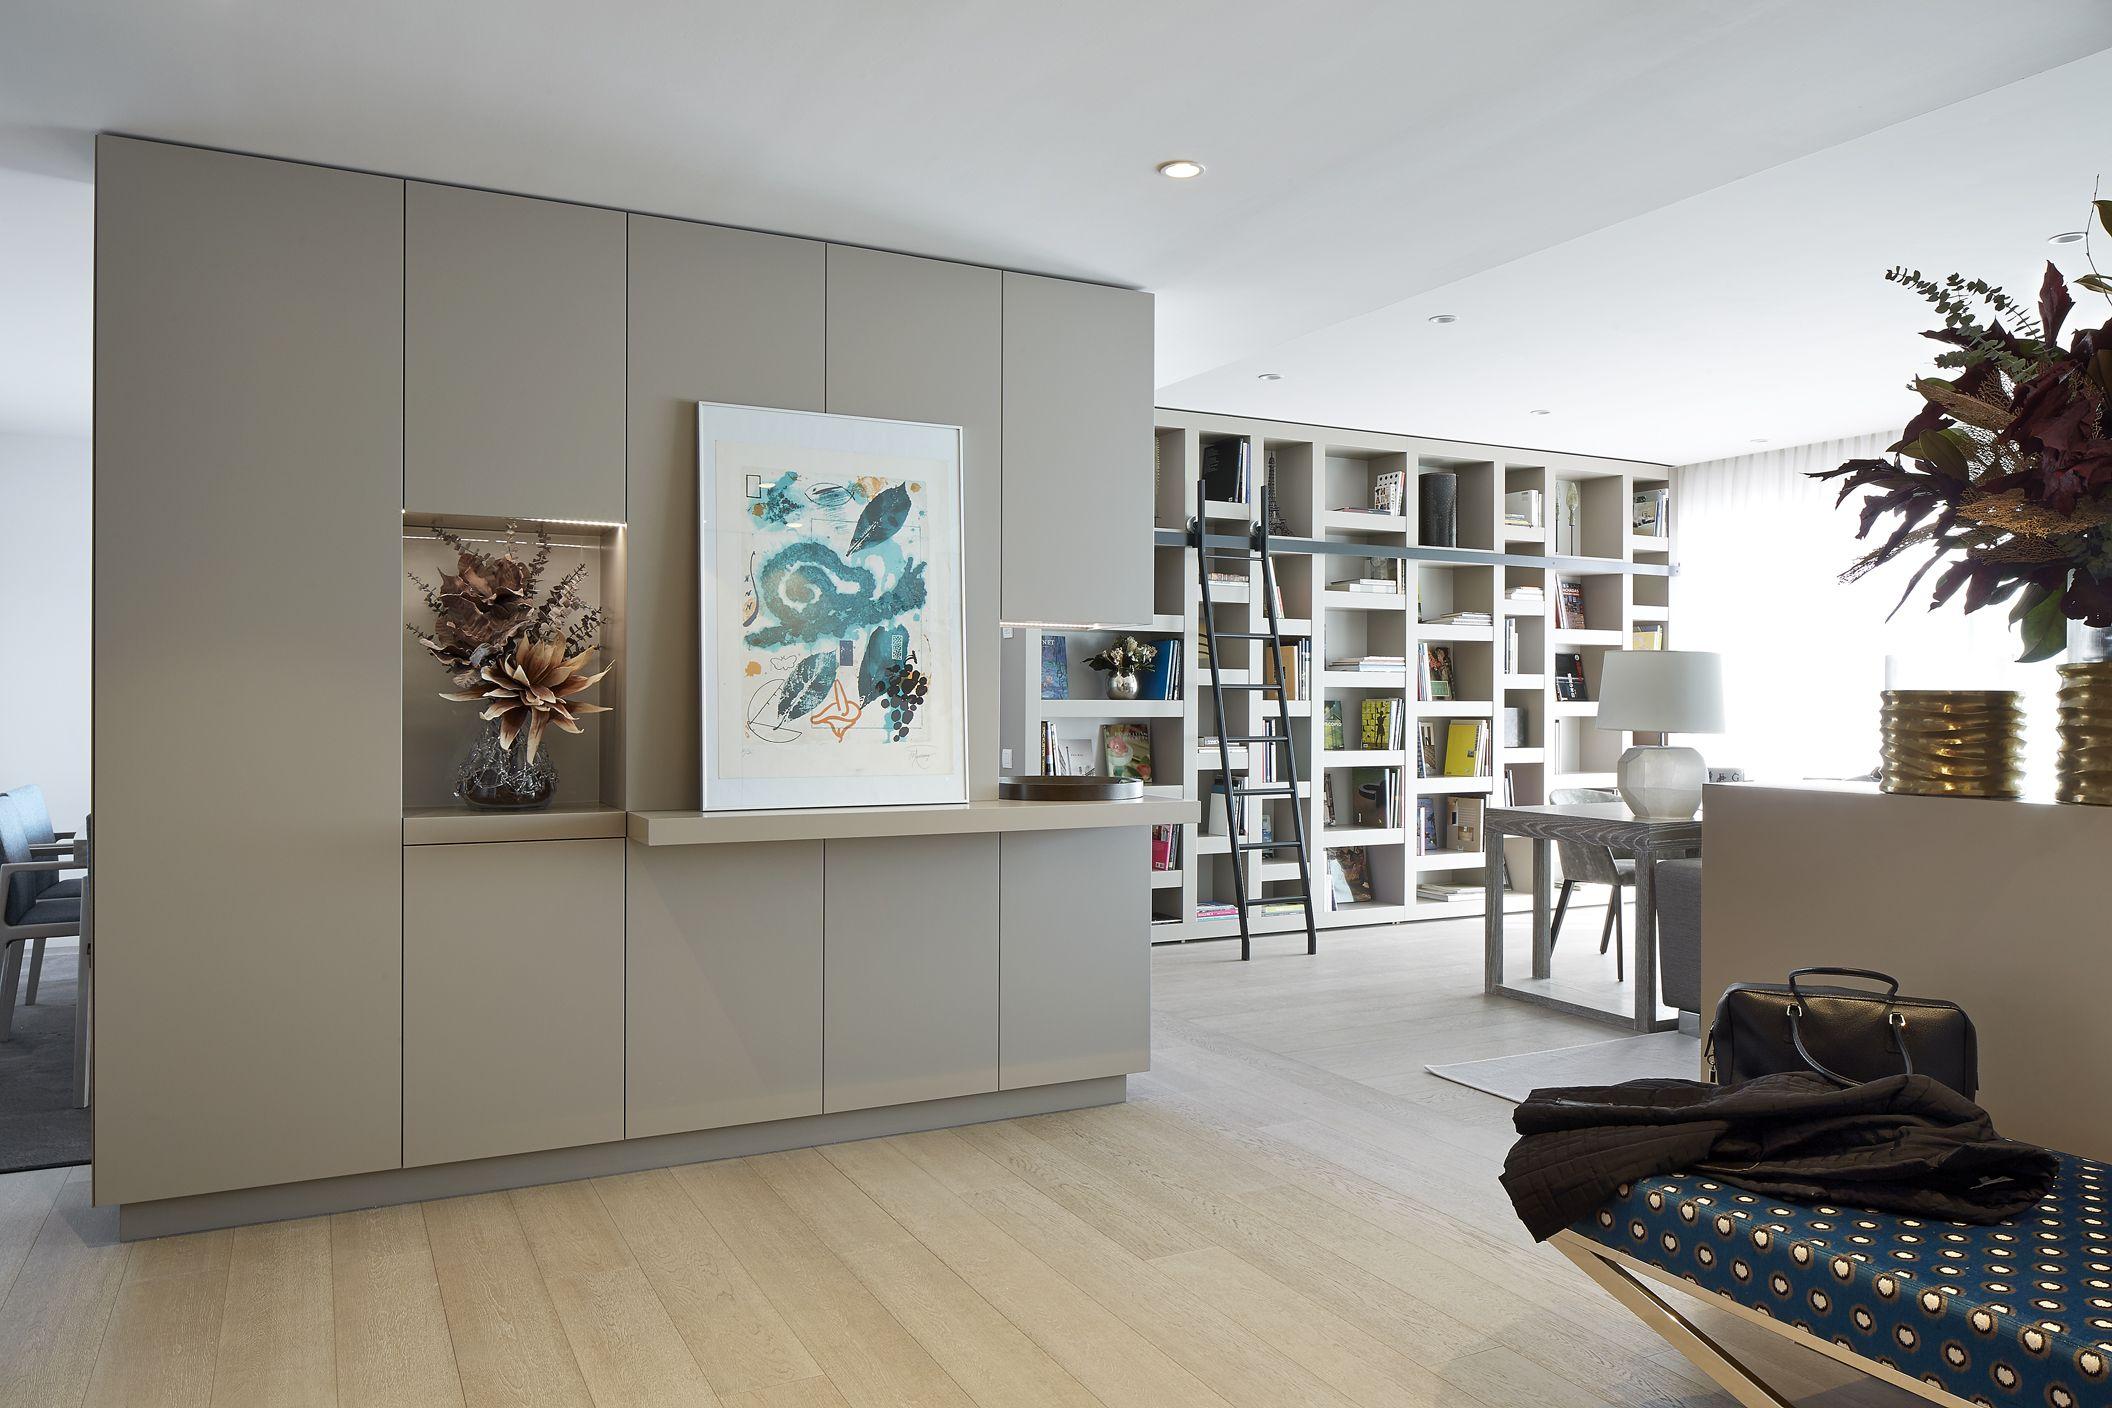 Molinsdesign decoraci n de interiores decoraciondecasas decoraciondeinteriores - Decoradores interioristas barcelona ...